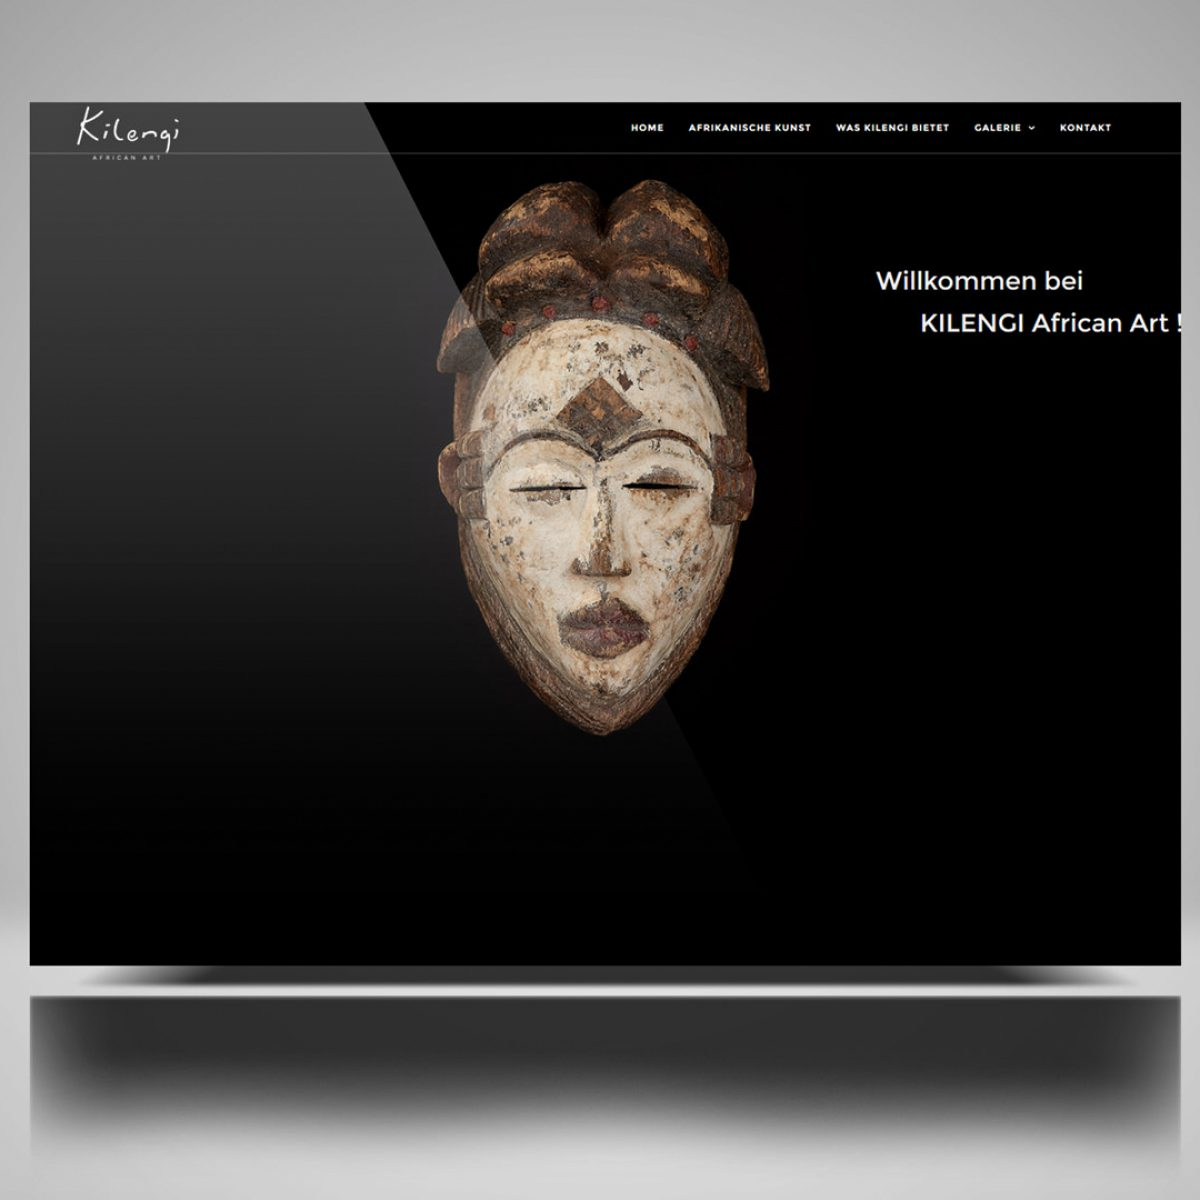 Webdesign Beispielprojekt Kilengi Africat Art